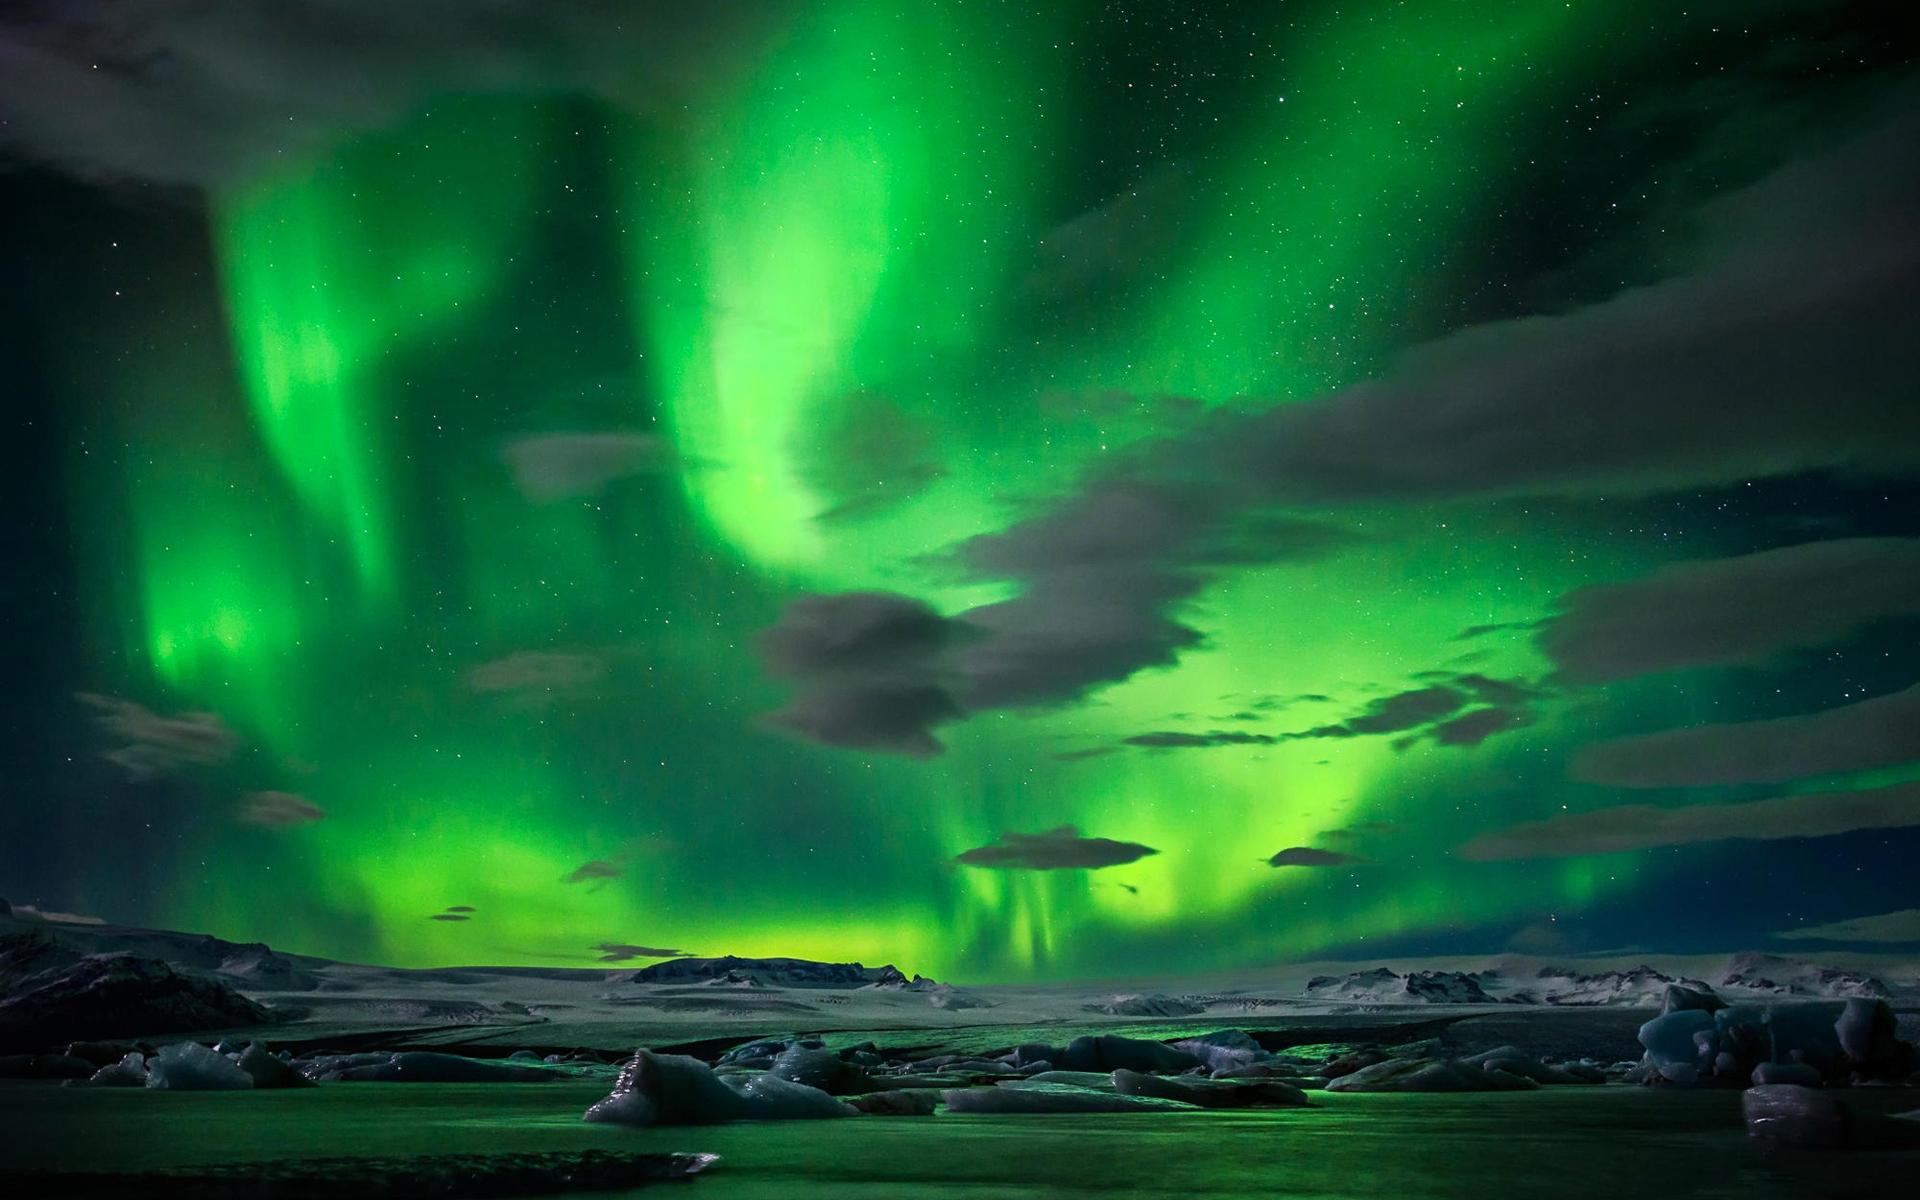 northern lights wallpaper 4k - photo #27